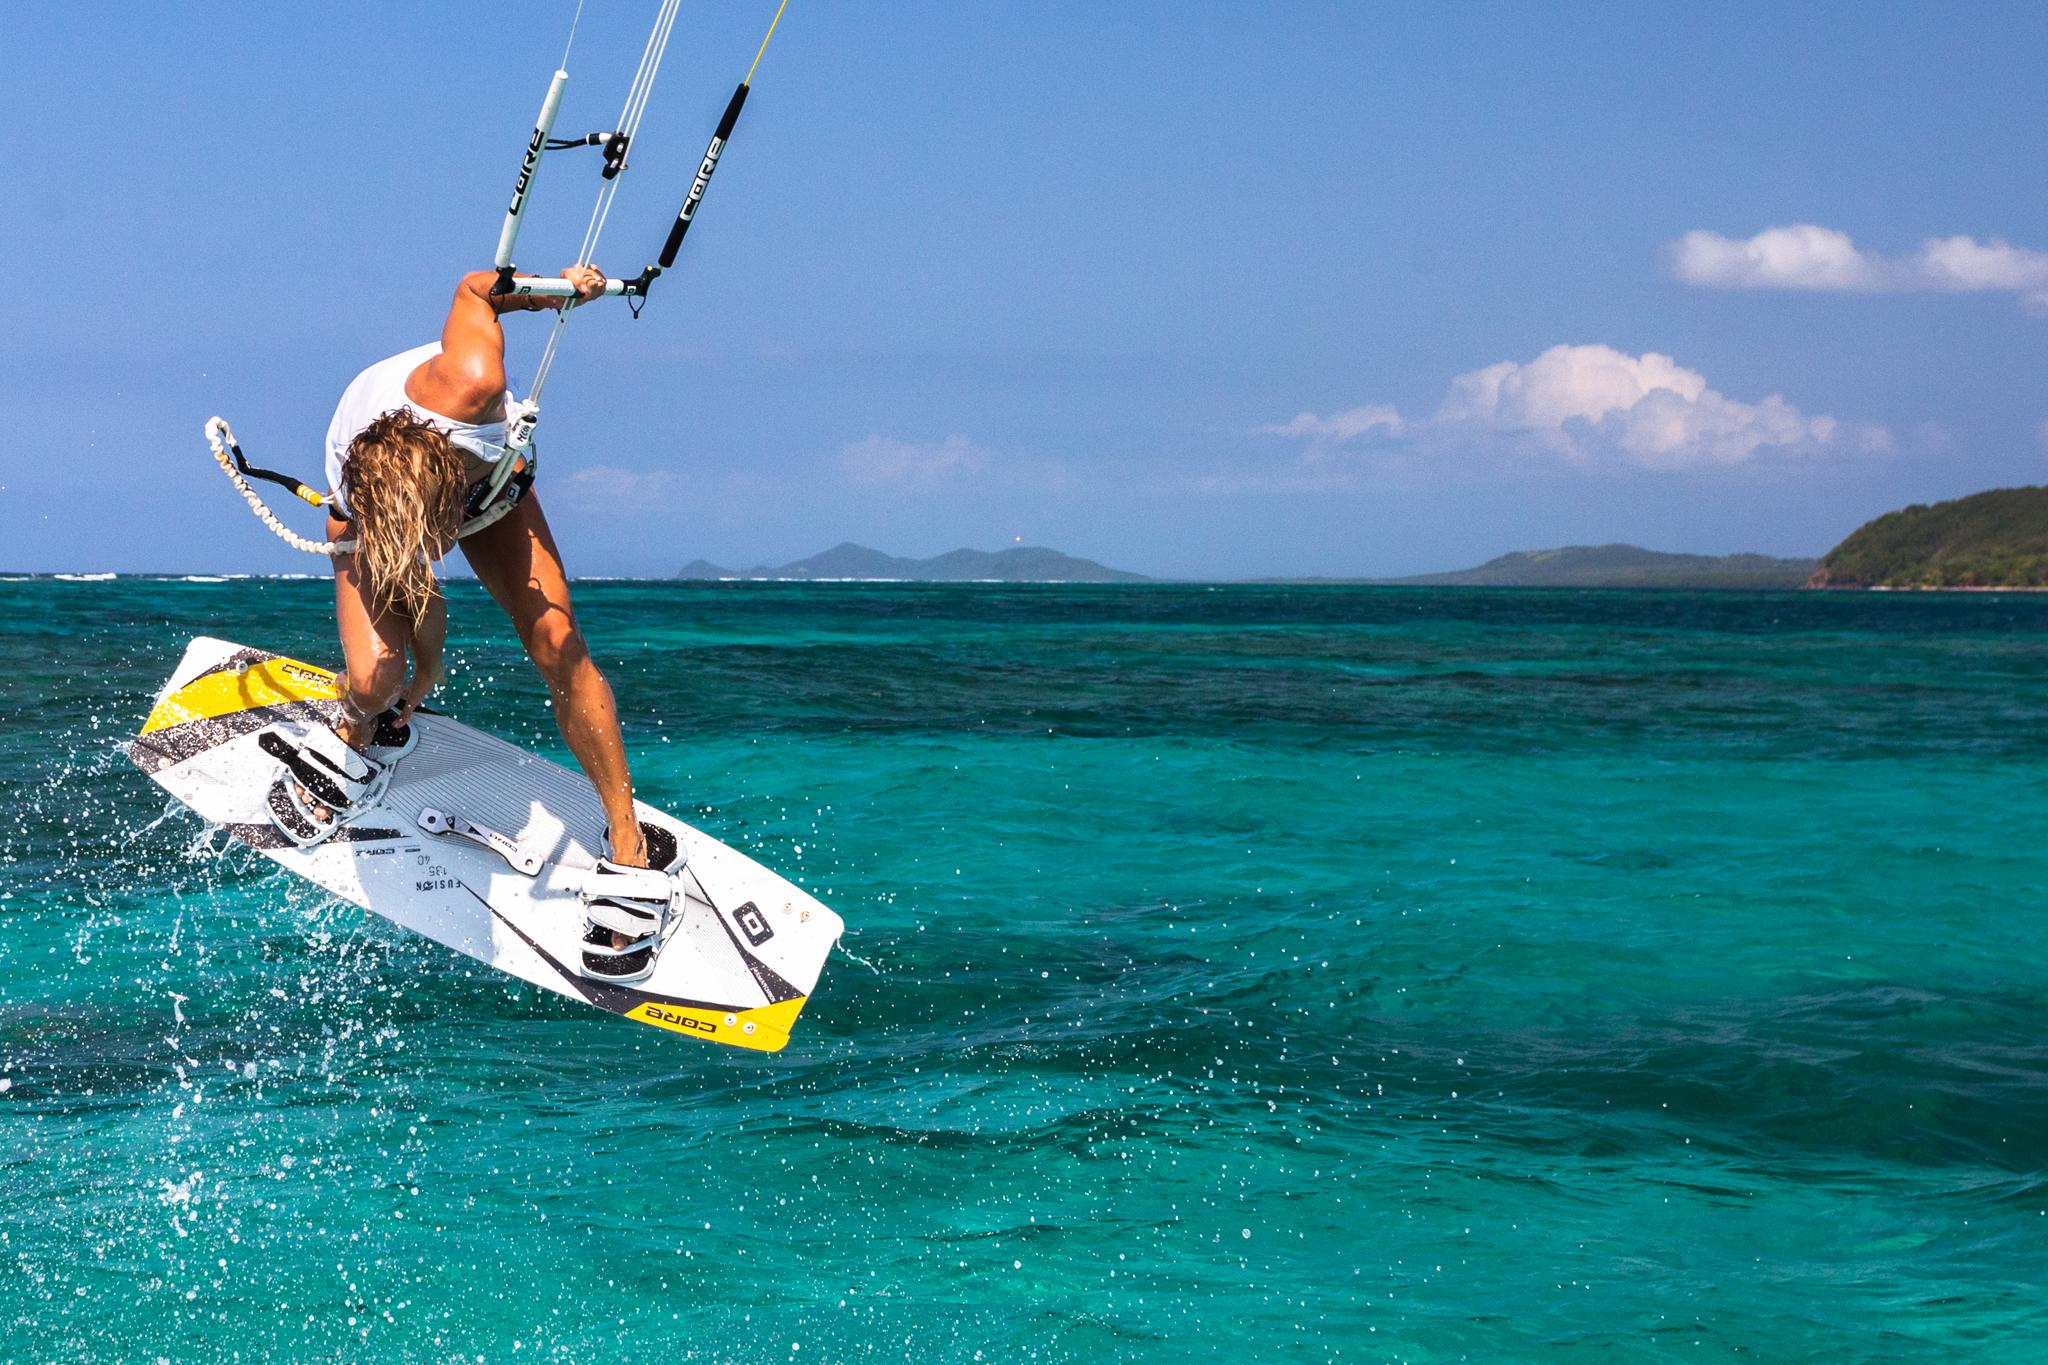 Honduras Kitesurfing Holidays and Travel Guides » Americas | Free